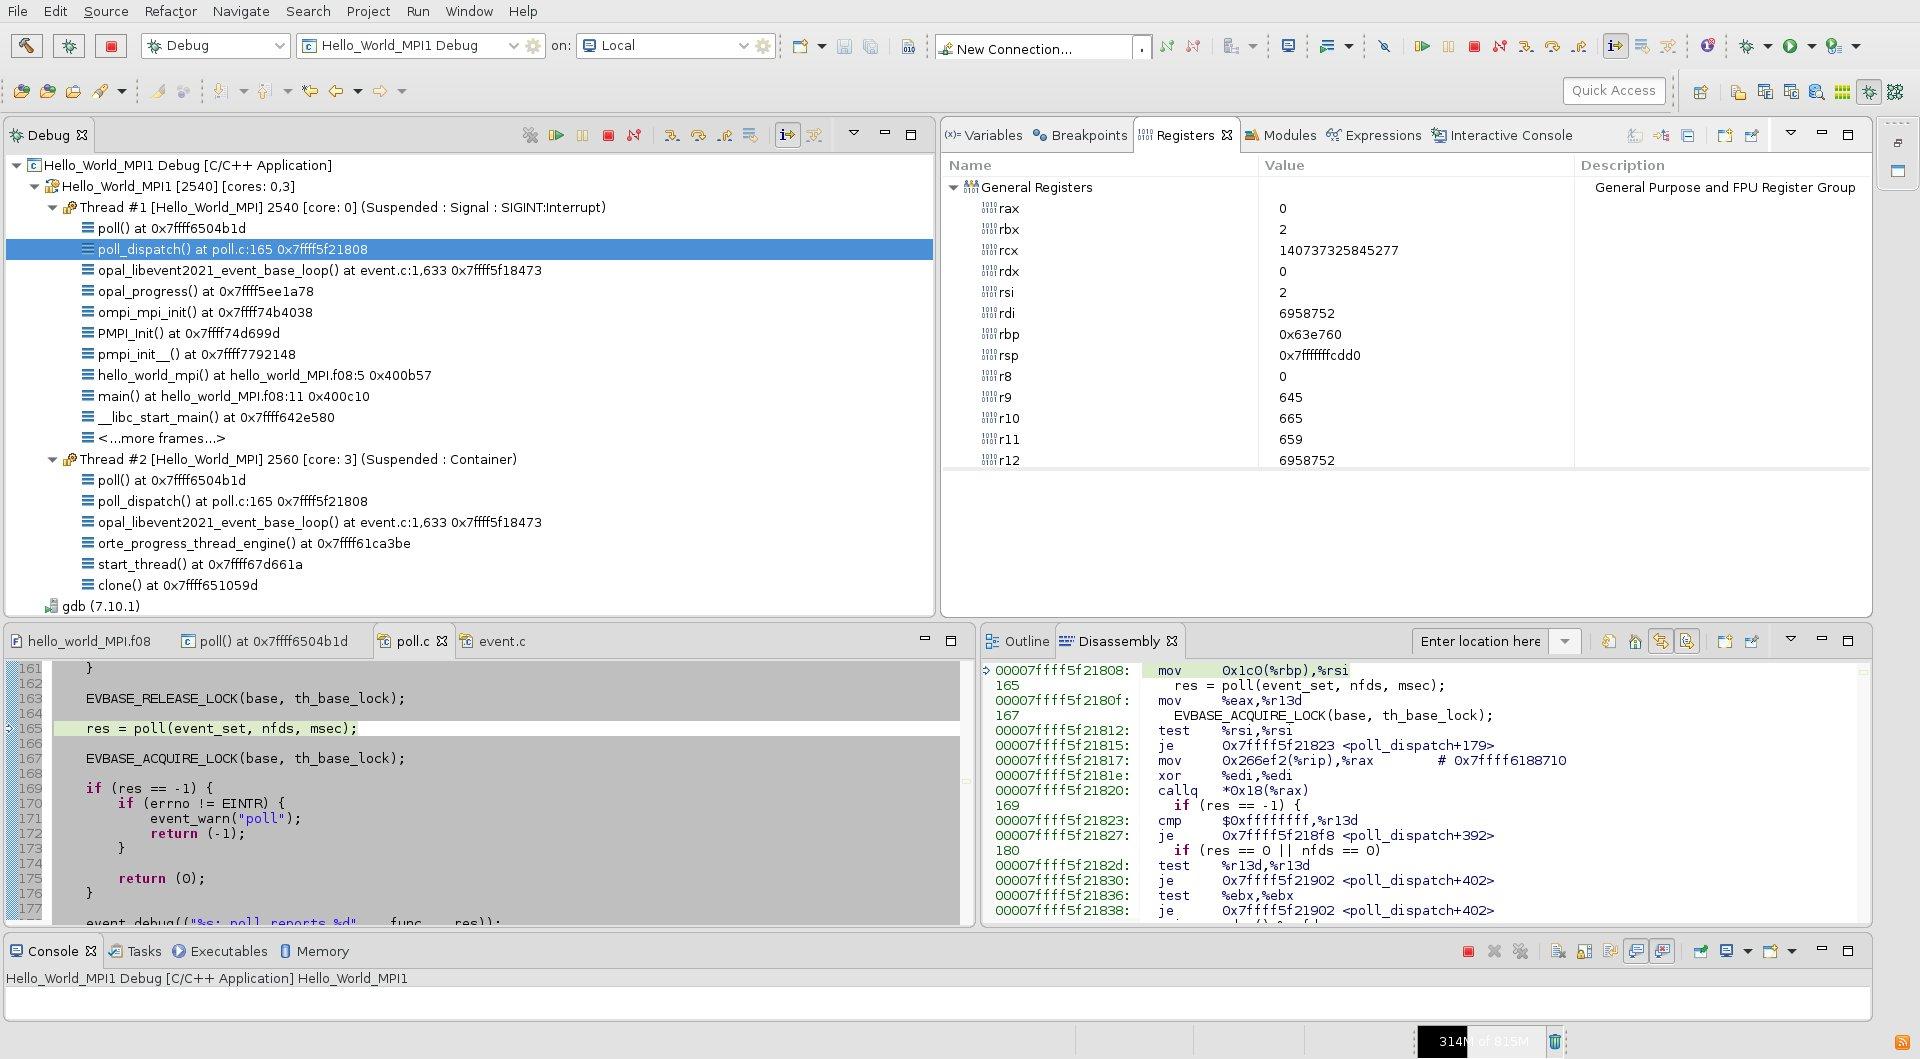 MK Dynamics - Programming - Programming in FORTRAN